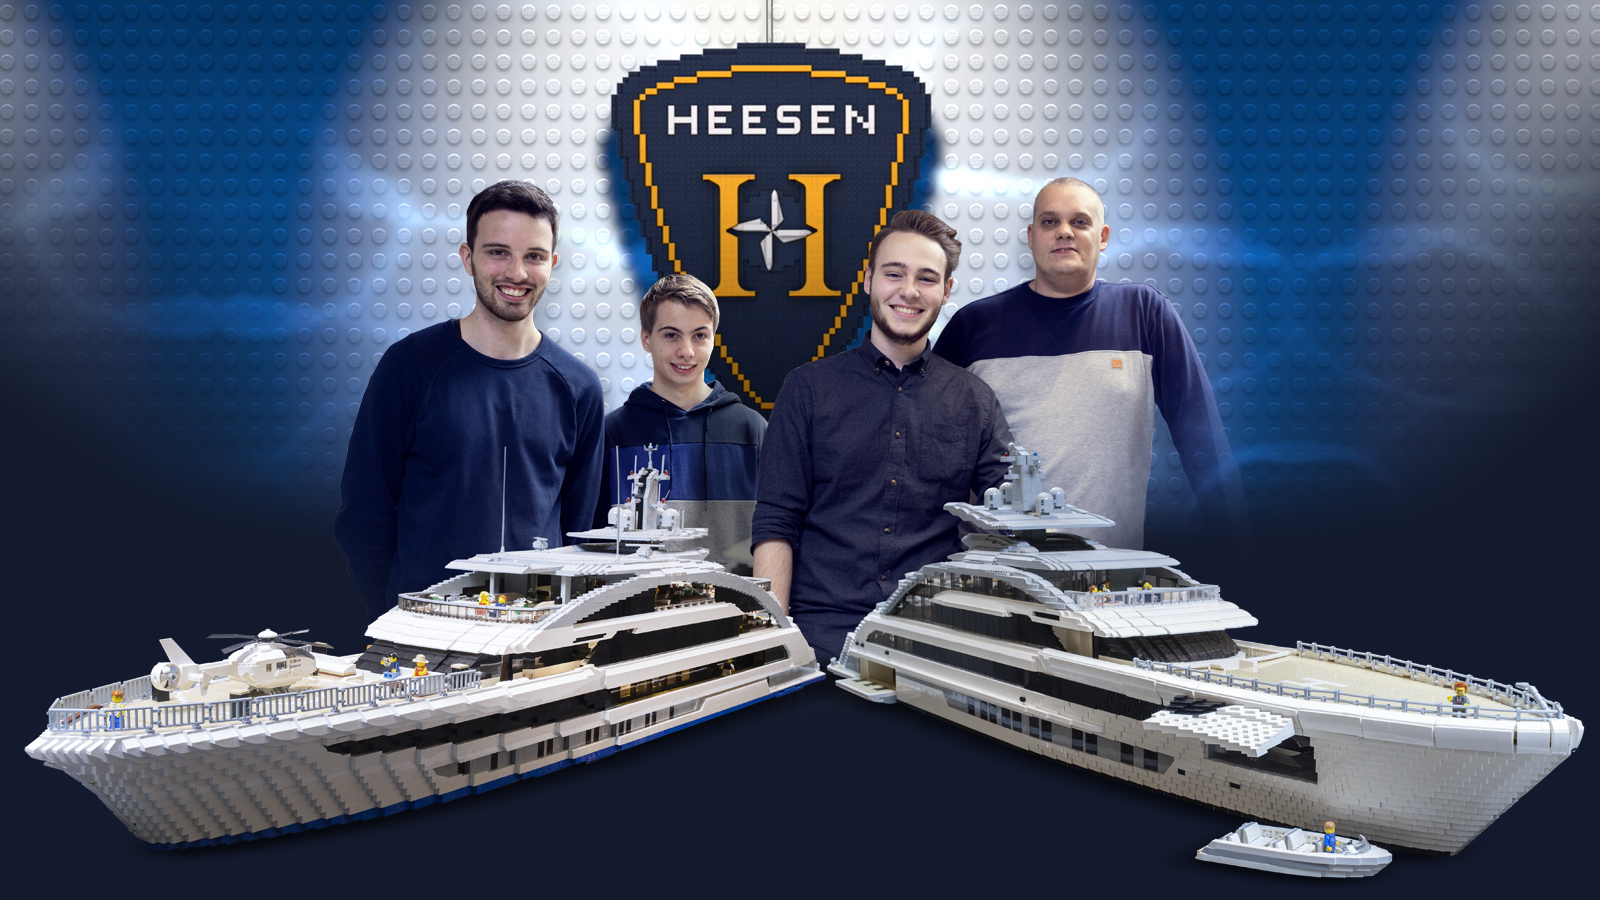 Who builds the best Heesen yacht in Legos?